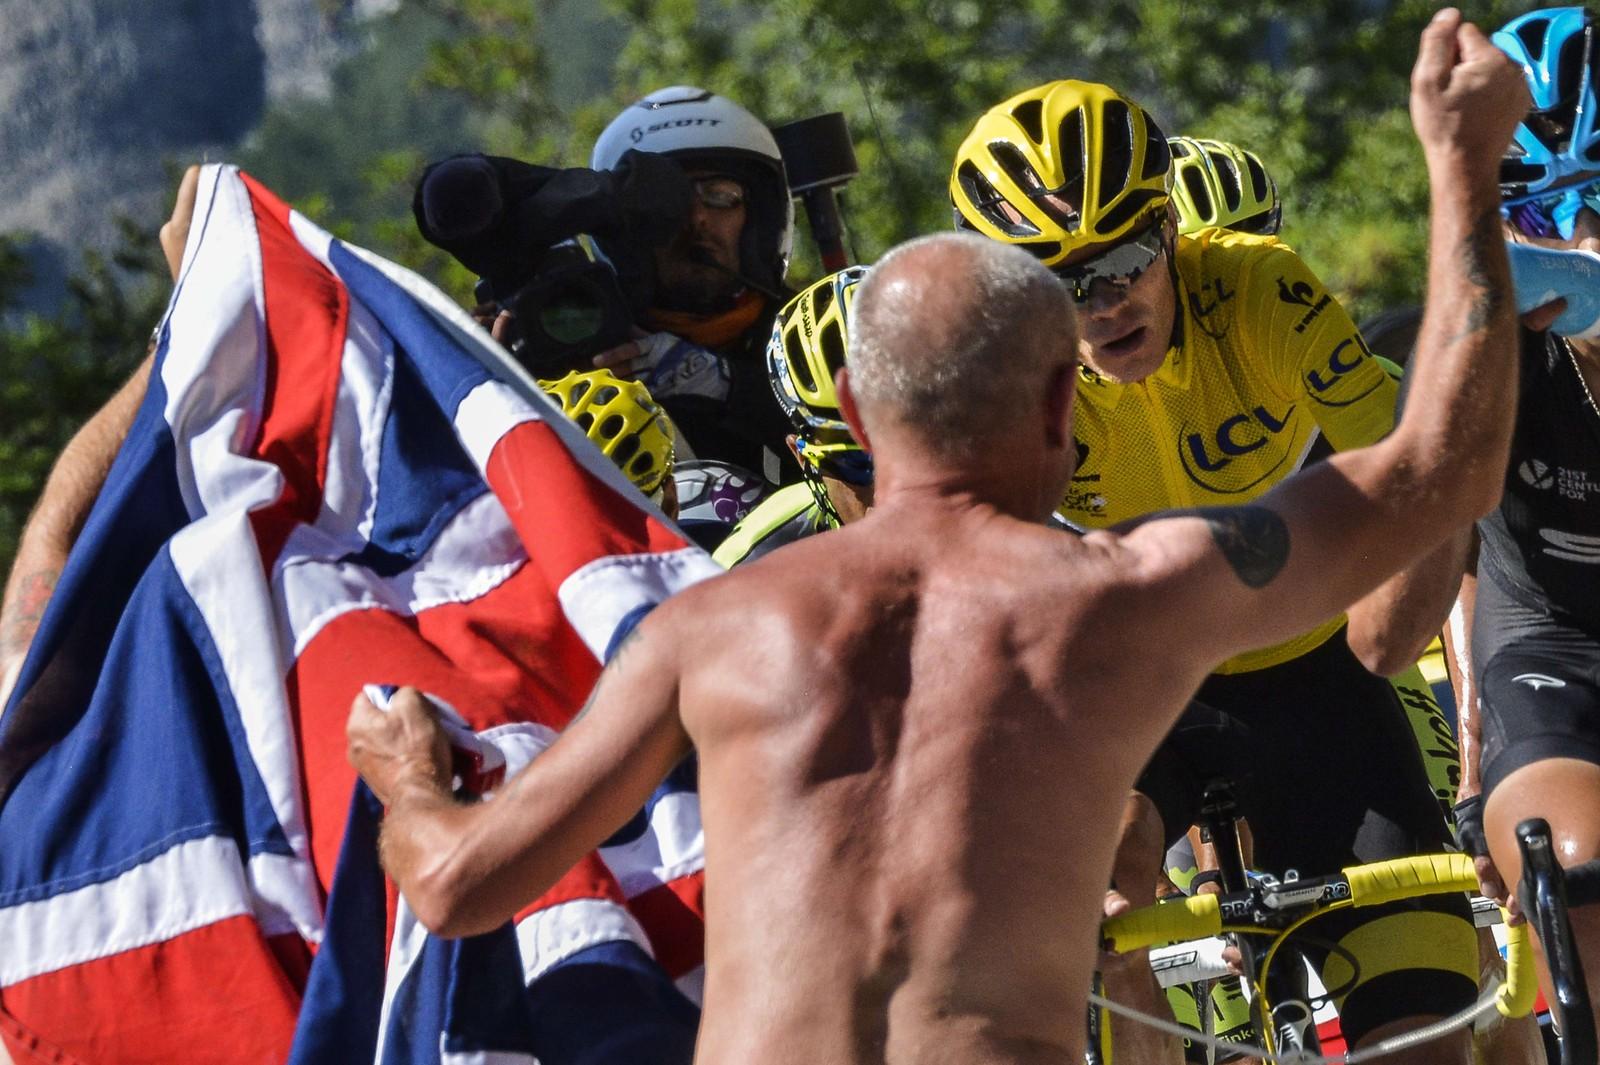 Chris Froome i den gule trøya måtte tåle nærkontakt med en rekke tilskuere. Han ble spyttet på minst to ganger, og ble kastet urin på. I dette tilfellet går det bra med Sky-rytteren. AFP PHOTO / JEFF PACHOUD